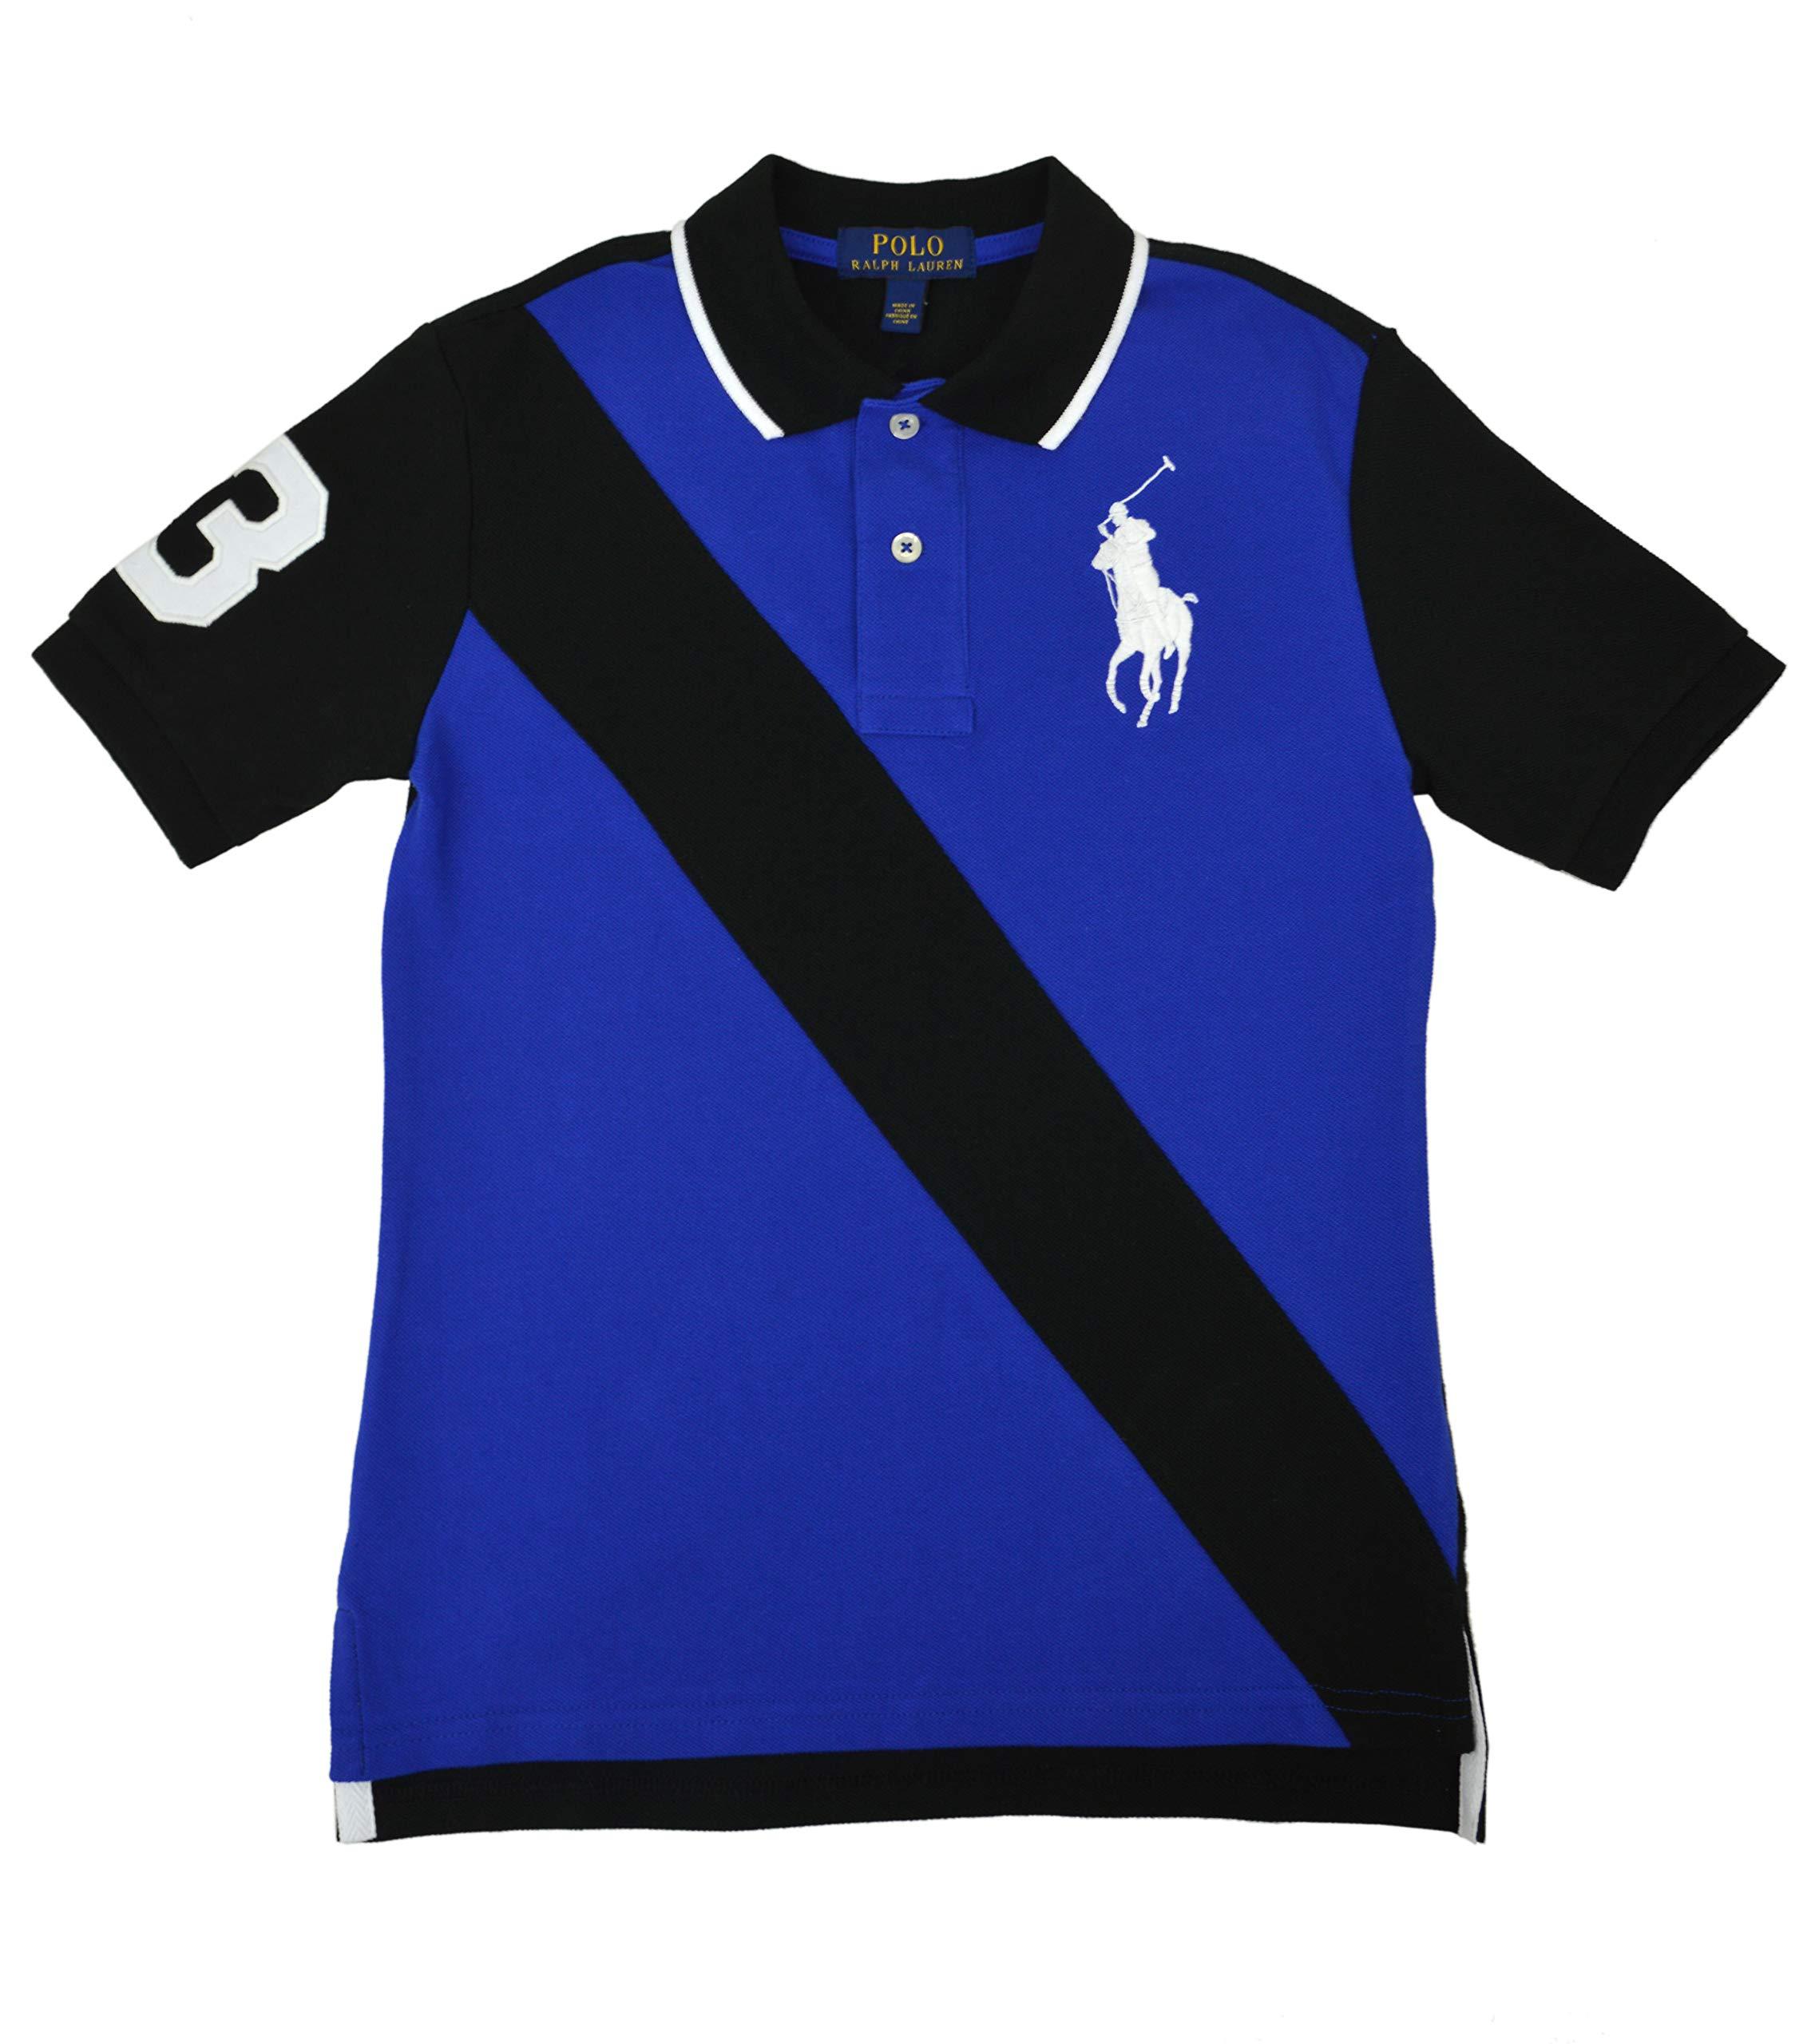 Polo Ralph Lauren Boys Toddlers Big Pony Sash Stripe Polo Shirt Royal Blue Black (7)